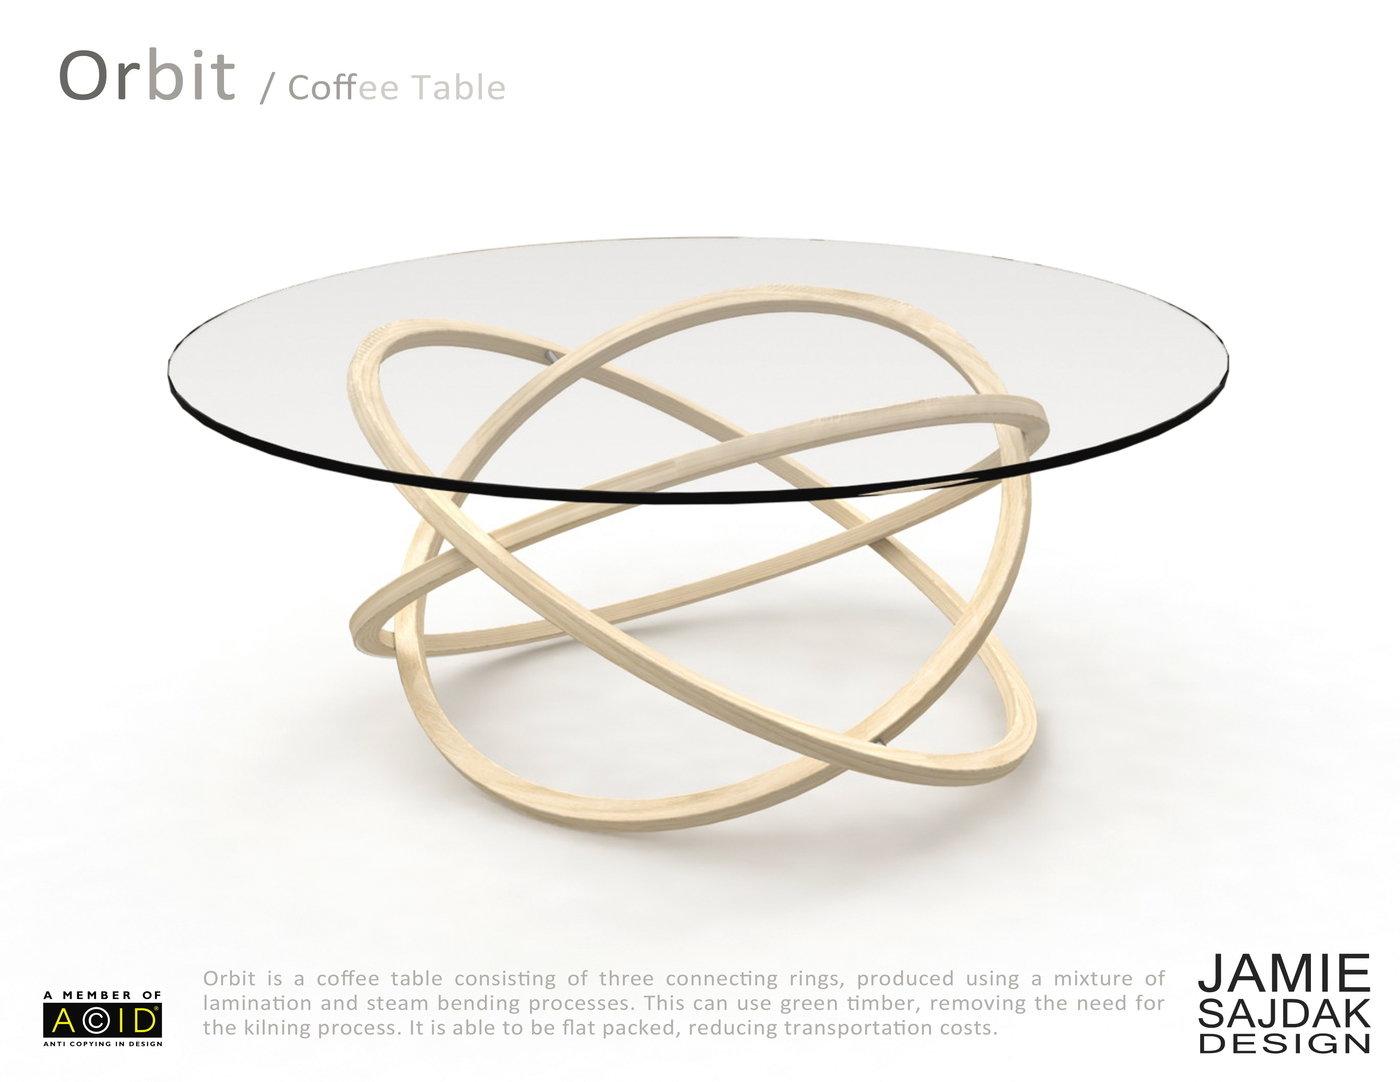 Orbit Coffee Table By Jamie Sajdak At Coroflotcom - Orbit coffee table